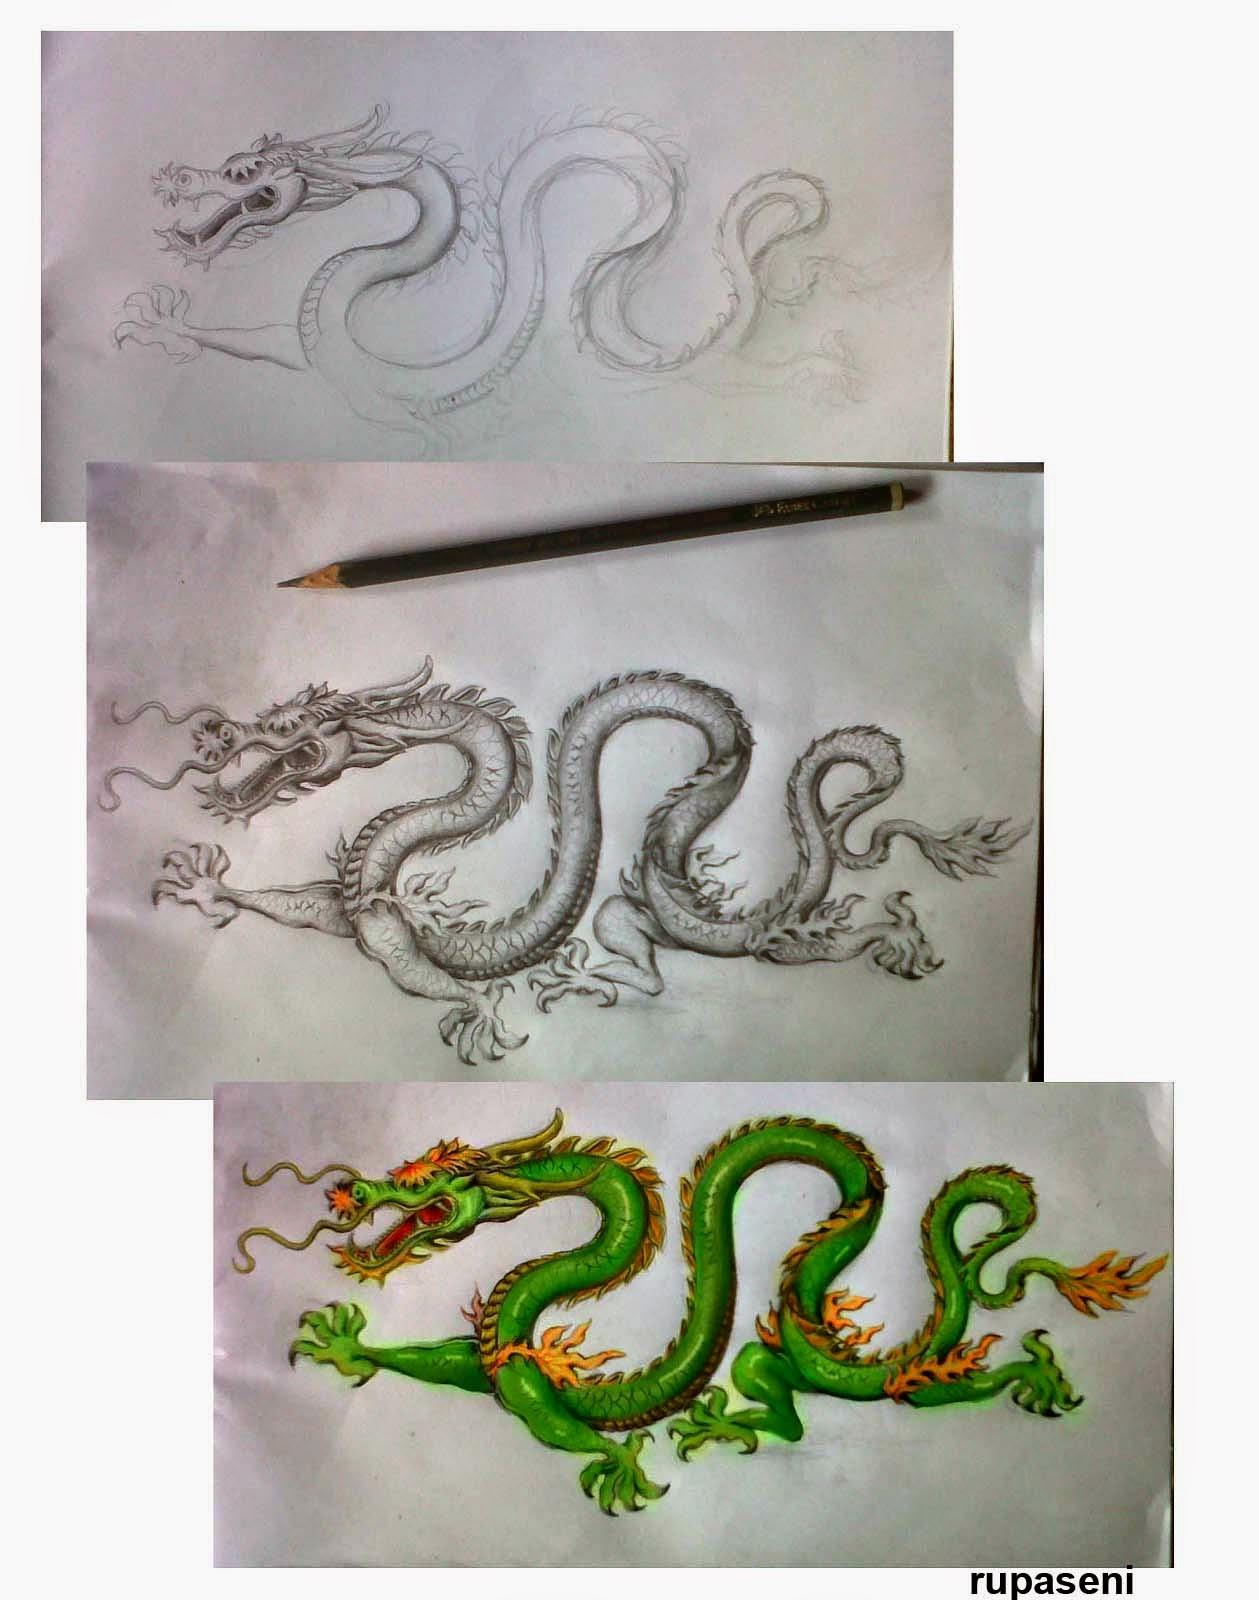 Galeri Sketsa Gambar Naga Bersayap